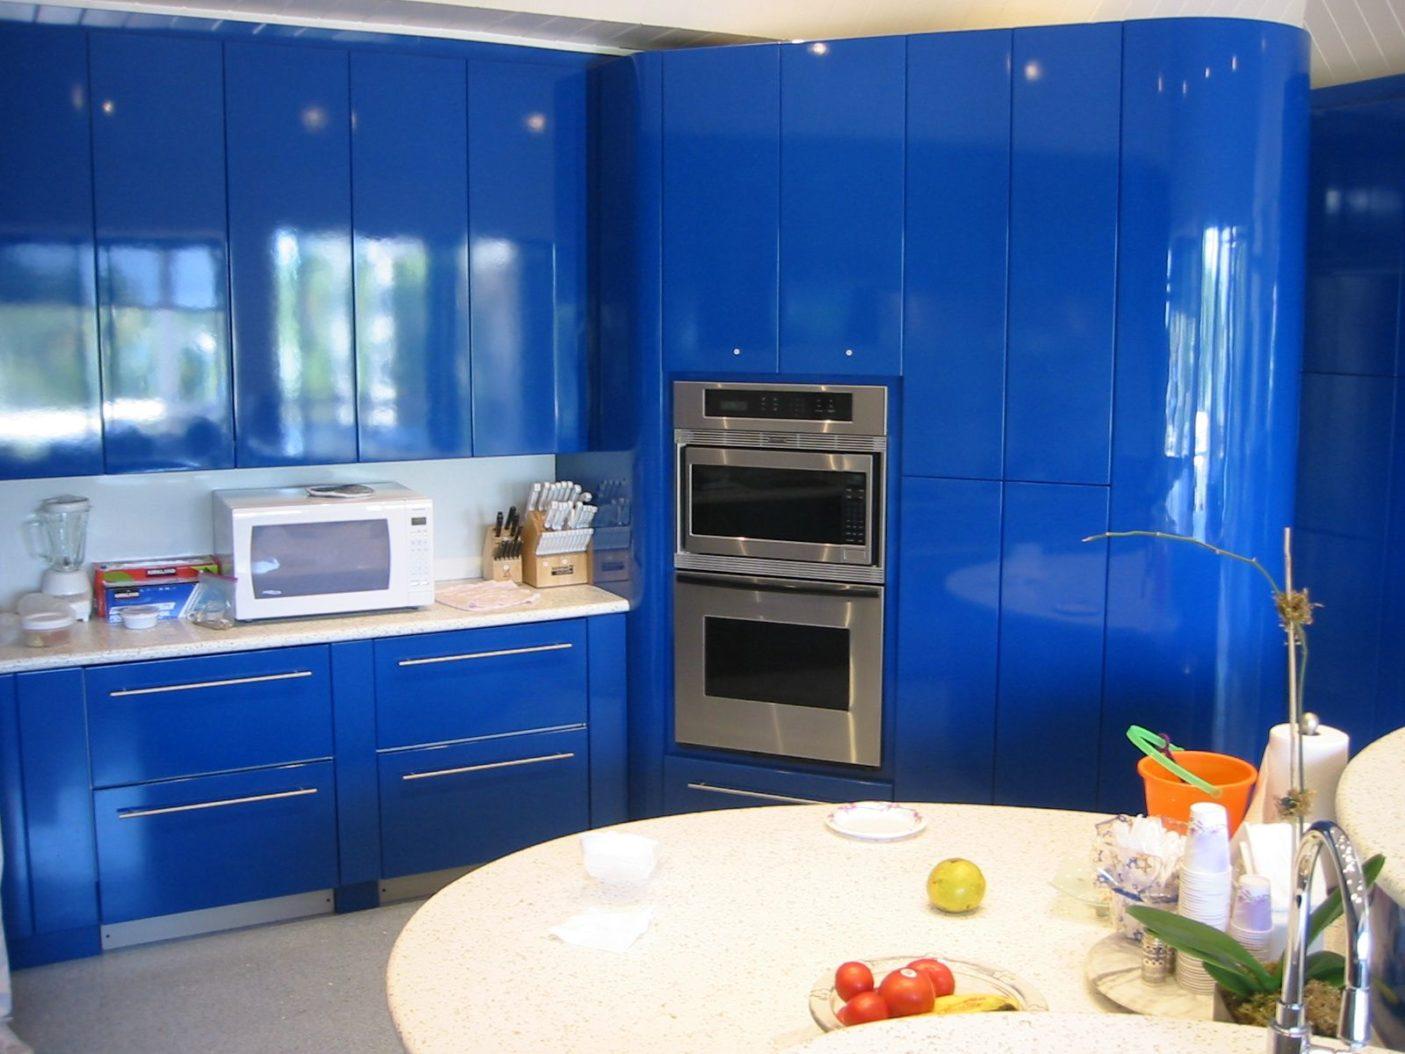 Kitchens-19.jpg